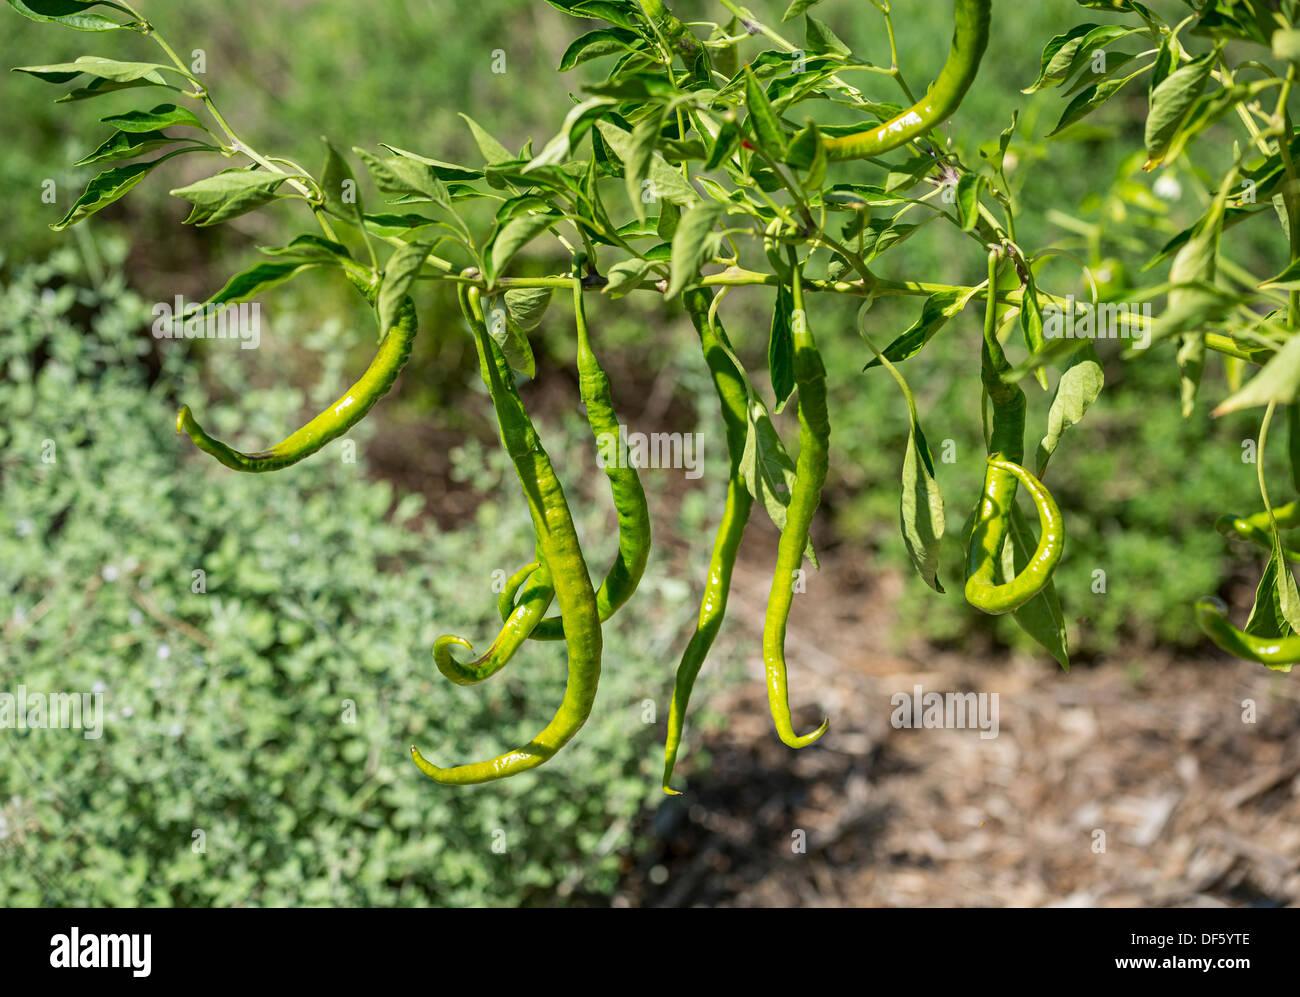 Joe's long cayenne pepper, Capsicum annuum. - Stock Image